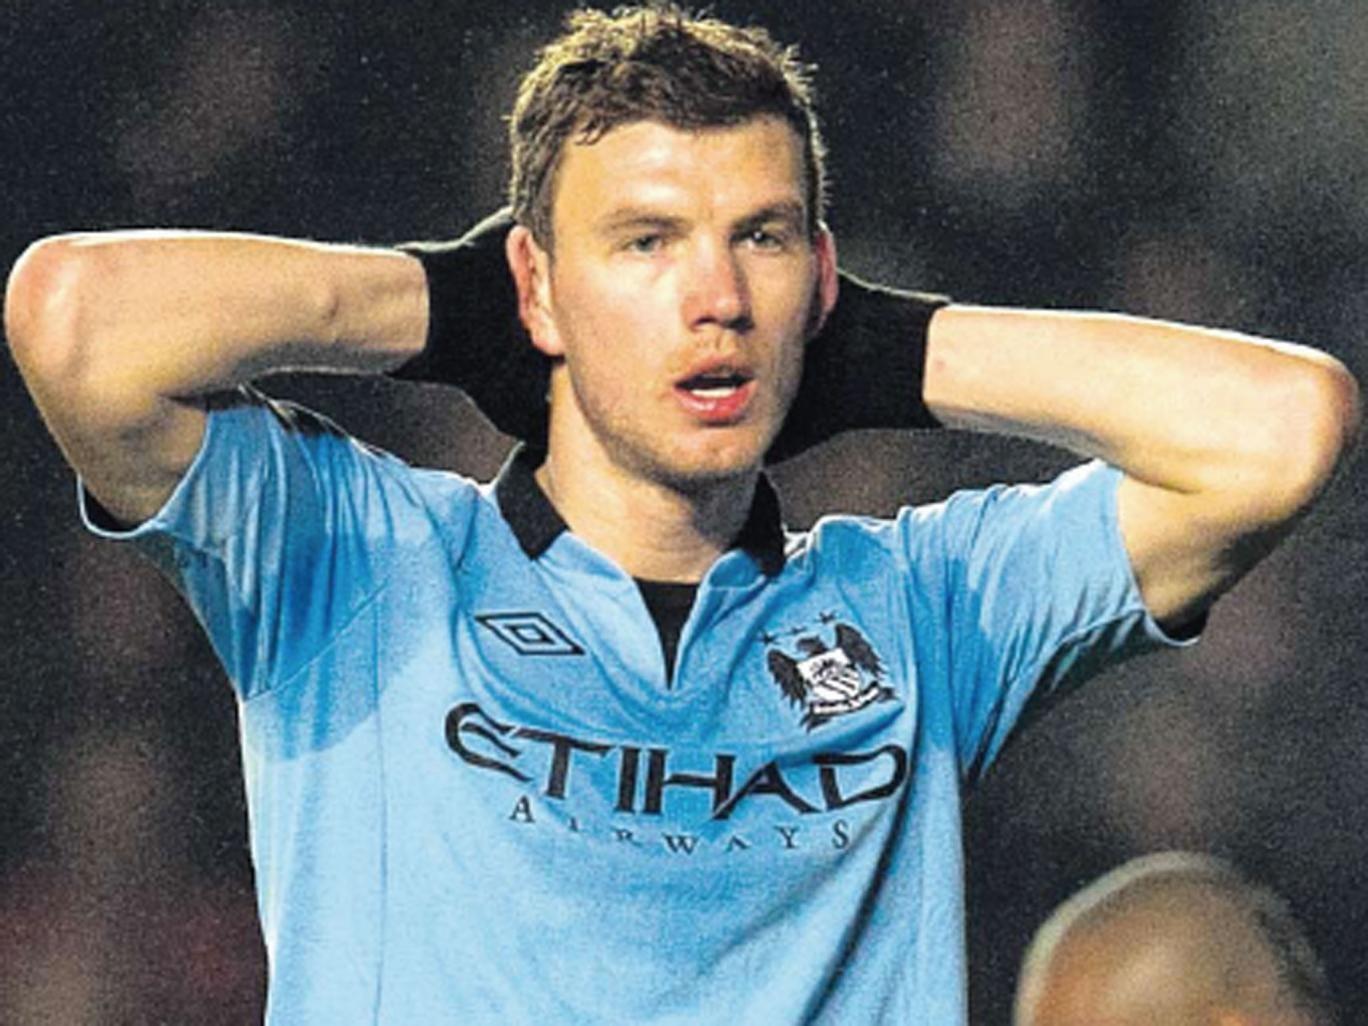 Manchester City striker Edin Dzeko could lose his starting place